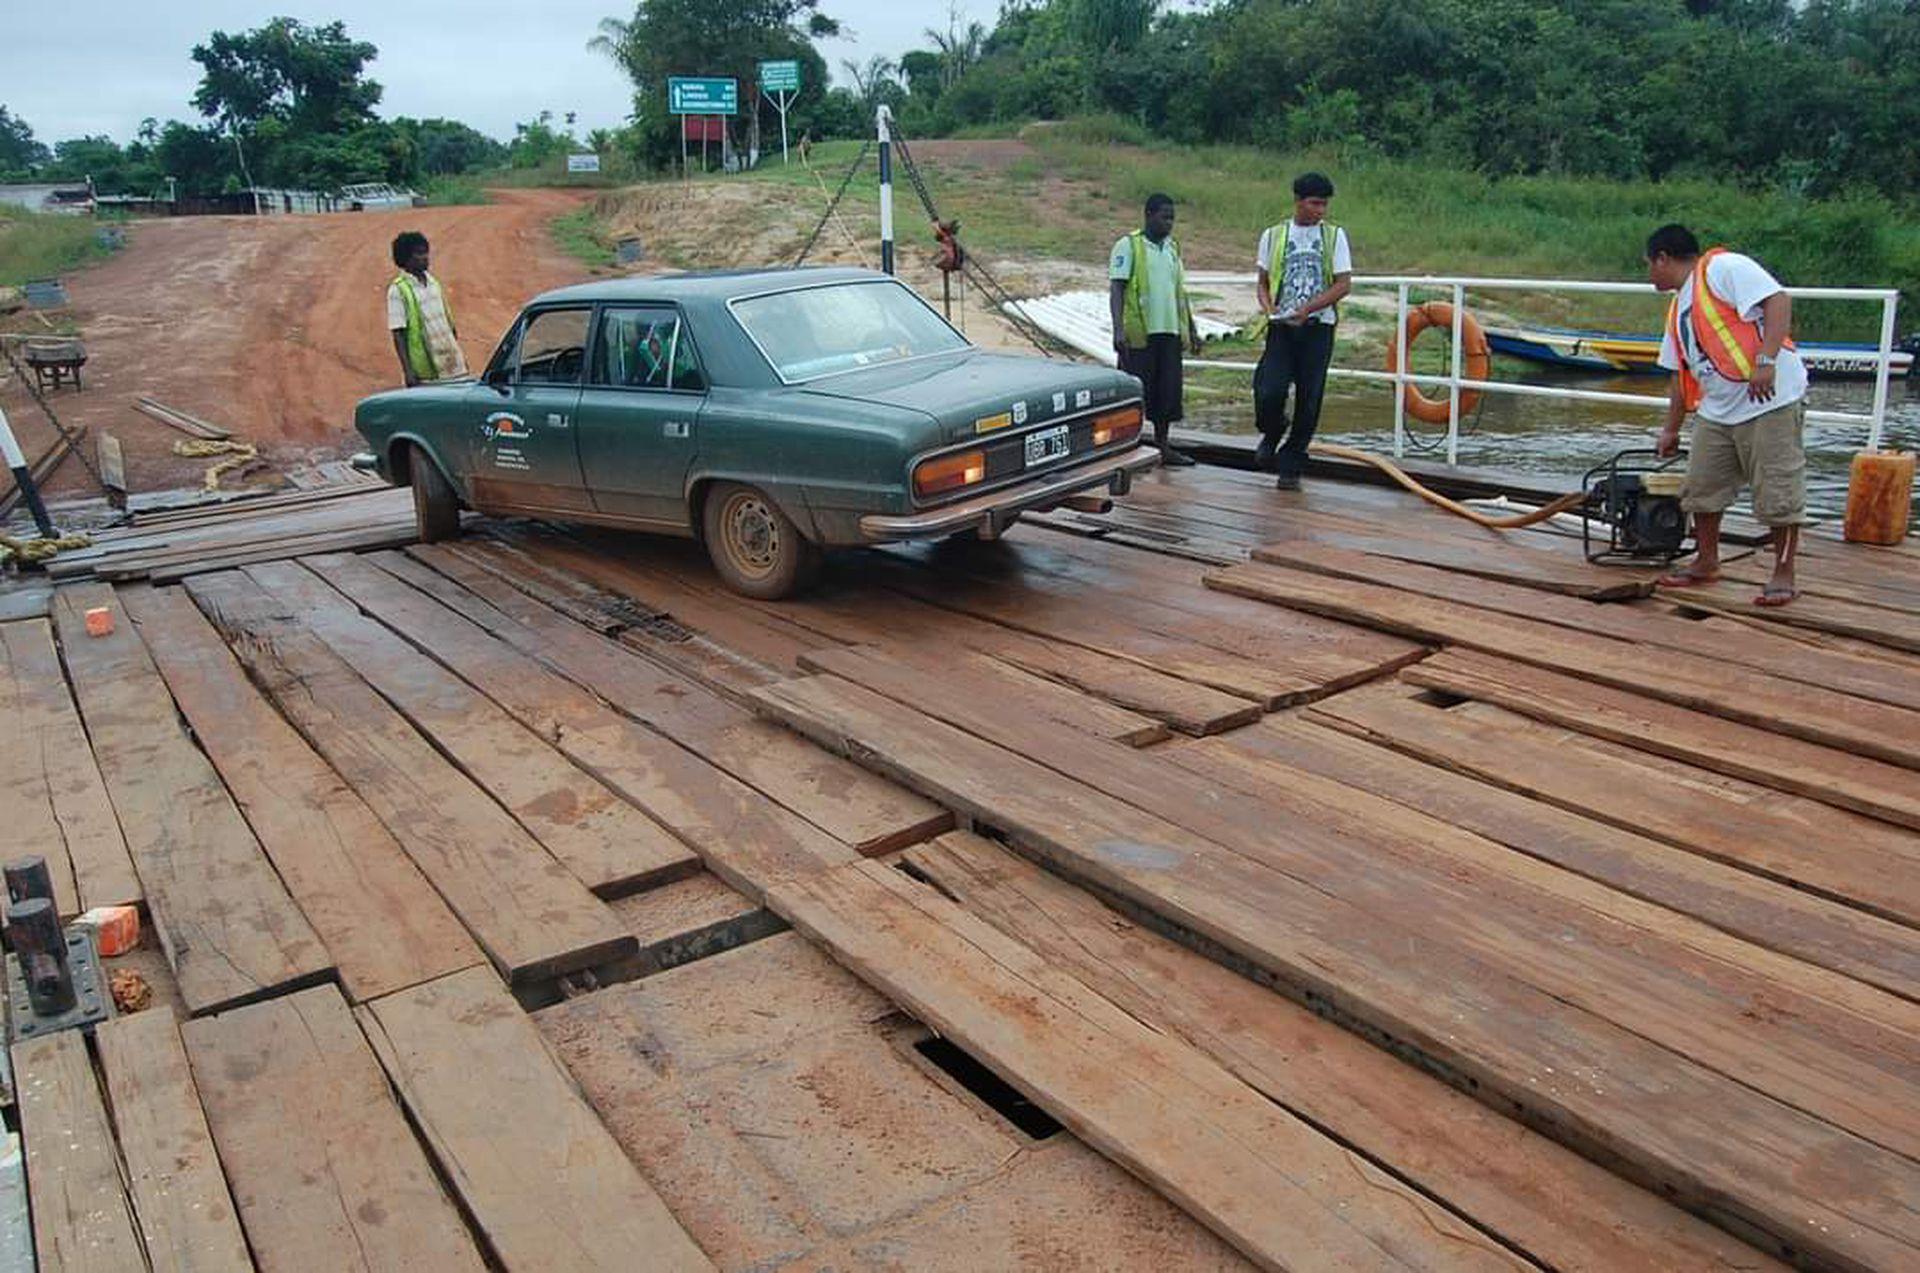 Cruce del río Esequibo, en Guyana. (Foto: RTB)